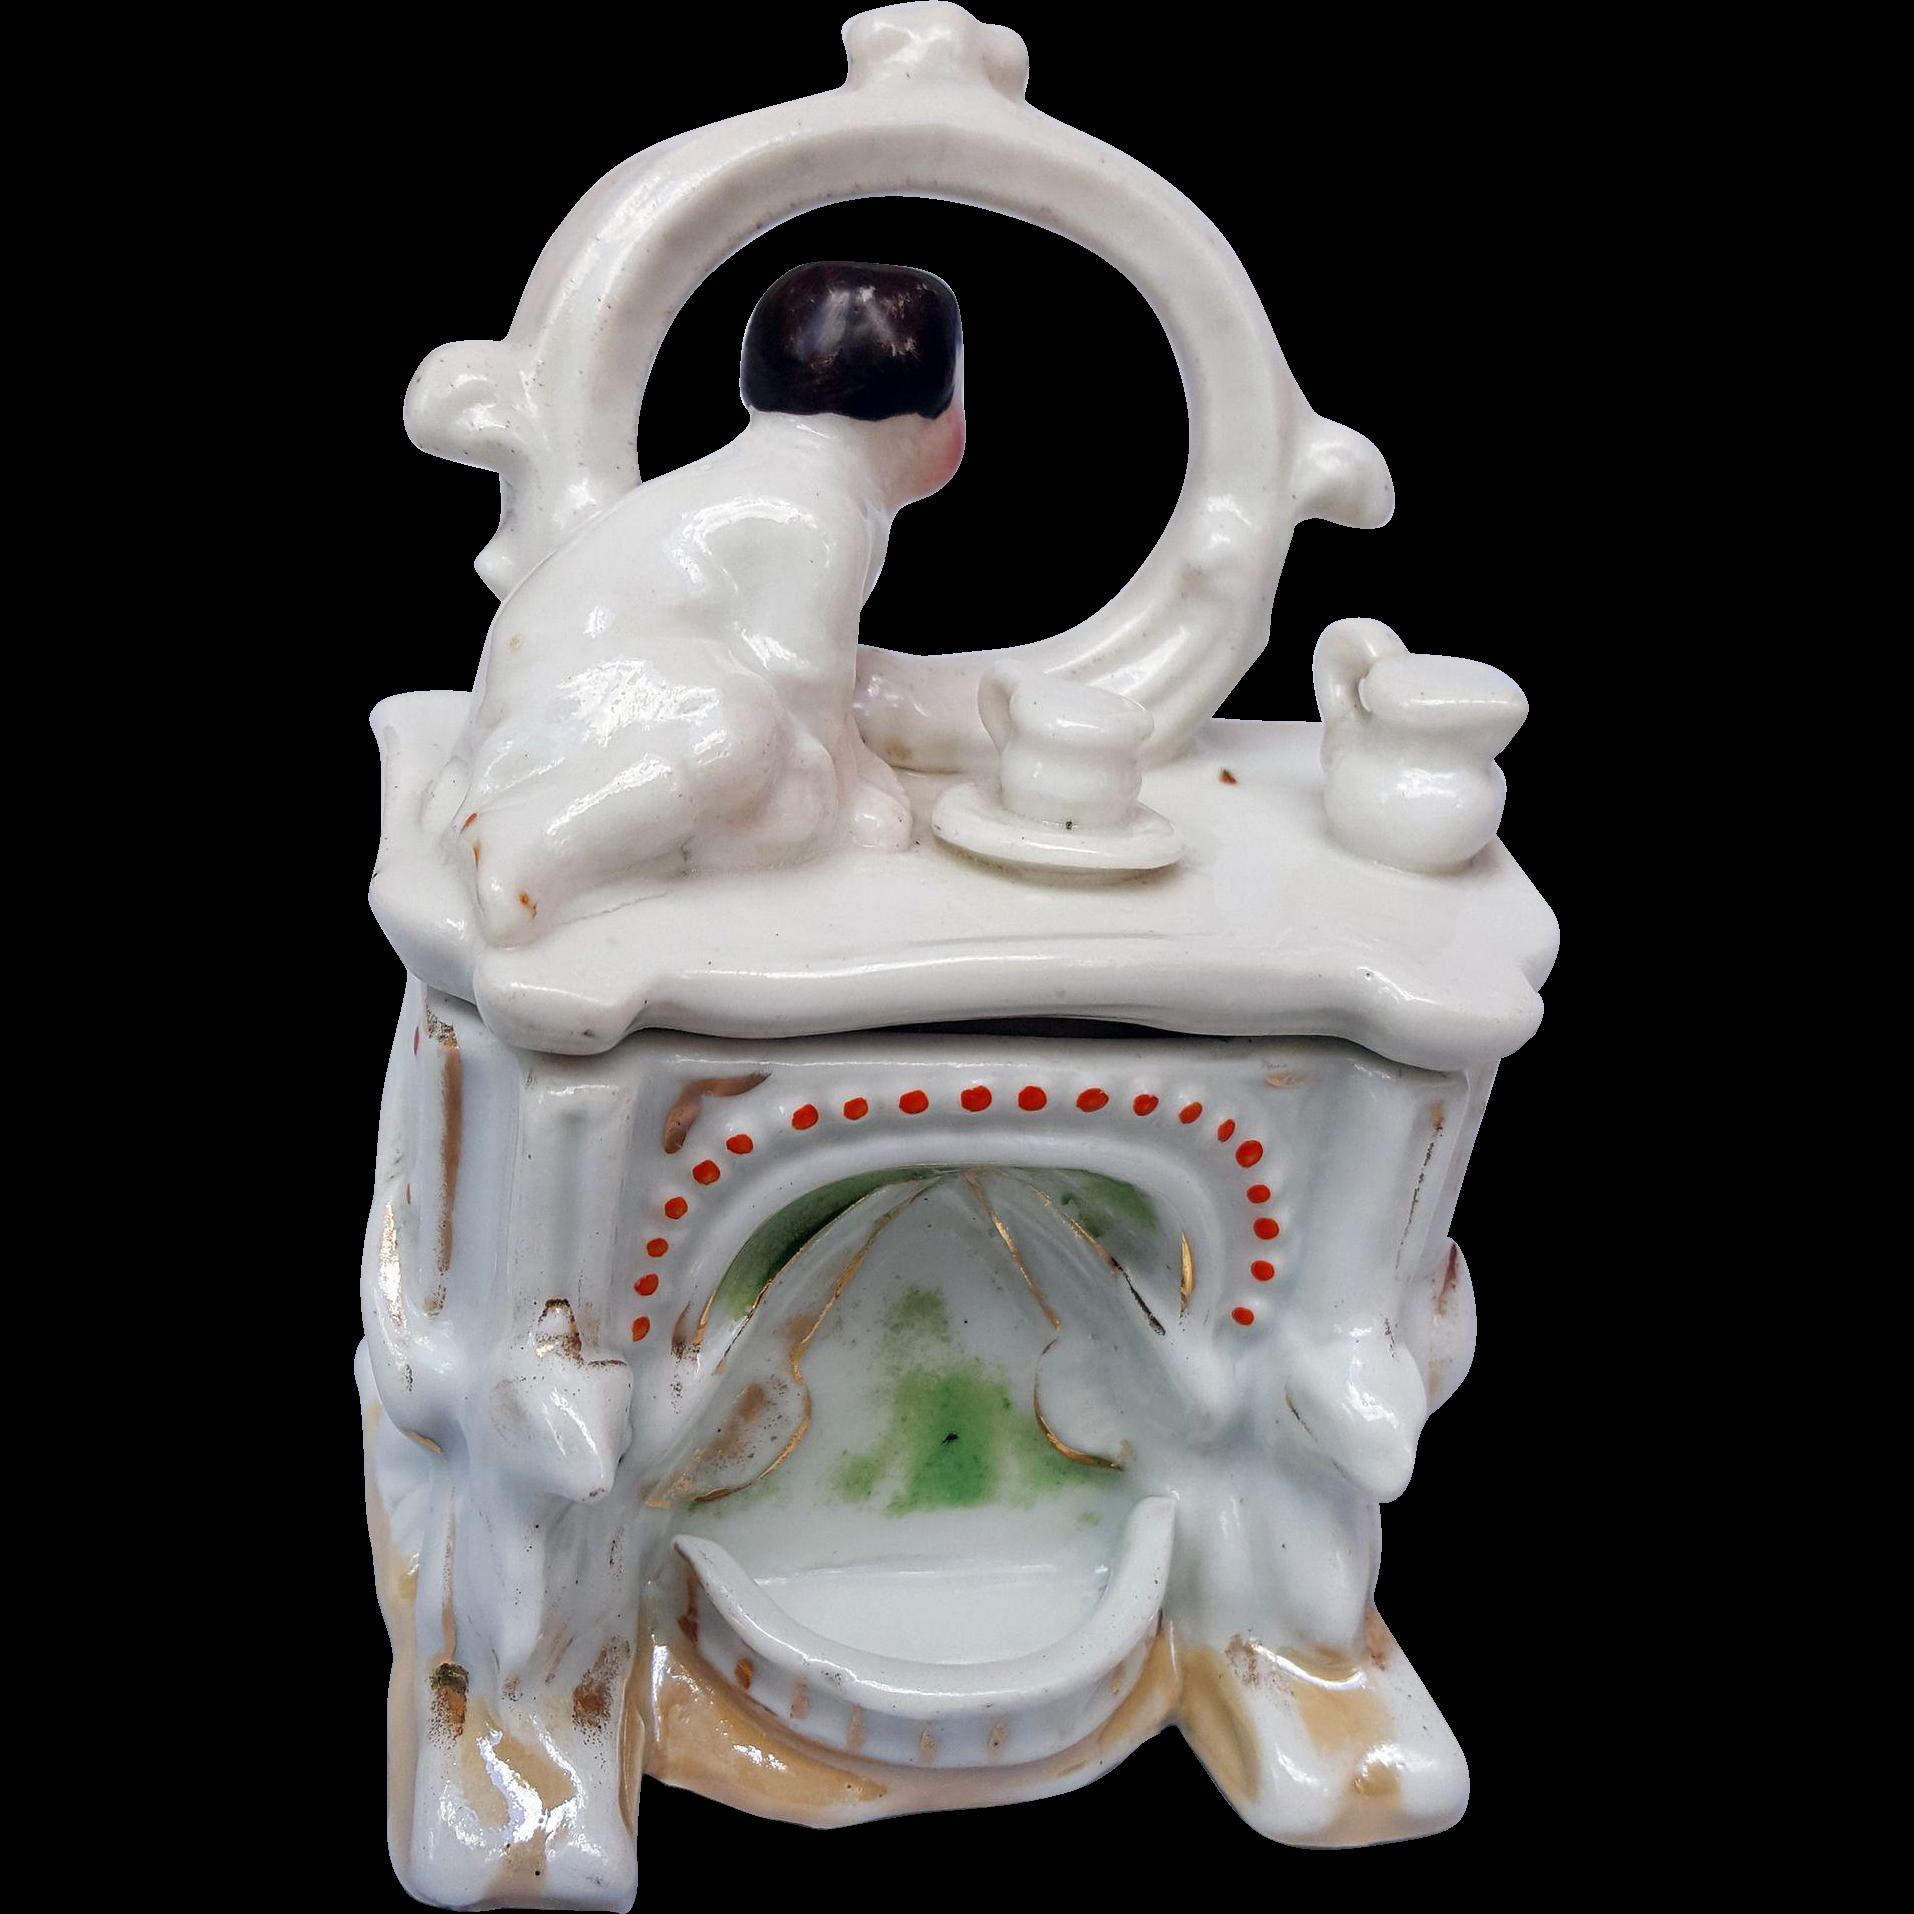 Antique porcelain fairing trinket dresser box baby infant child on dresser bureau looking in mirror  3.75 inch